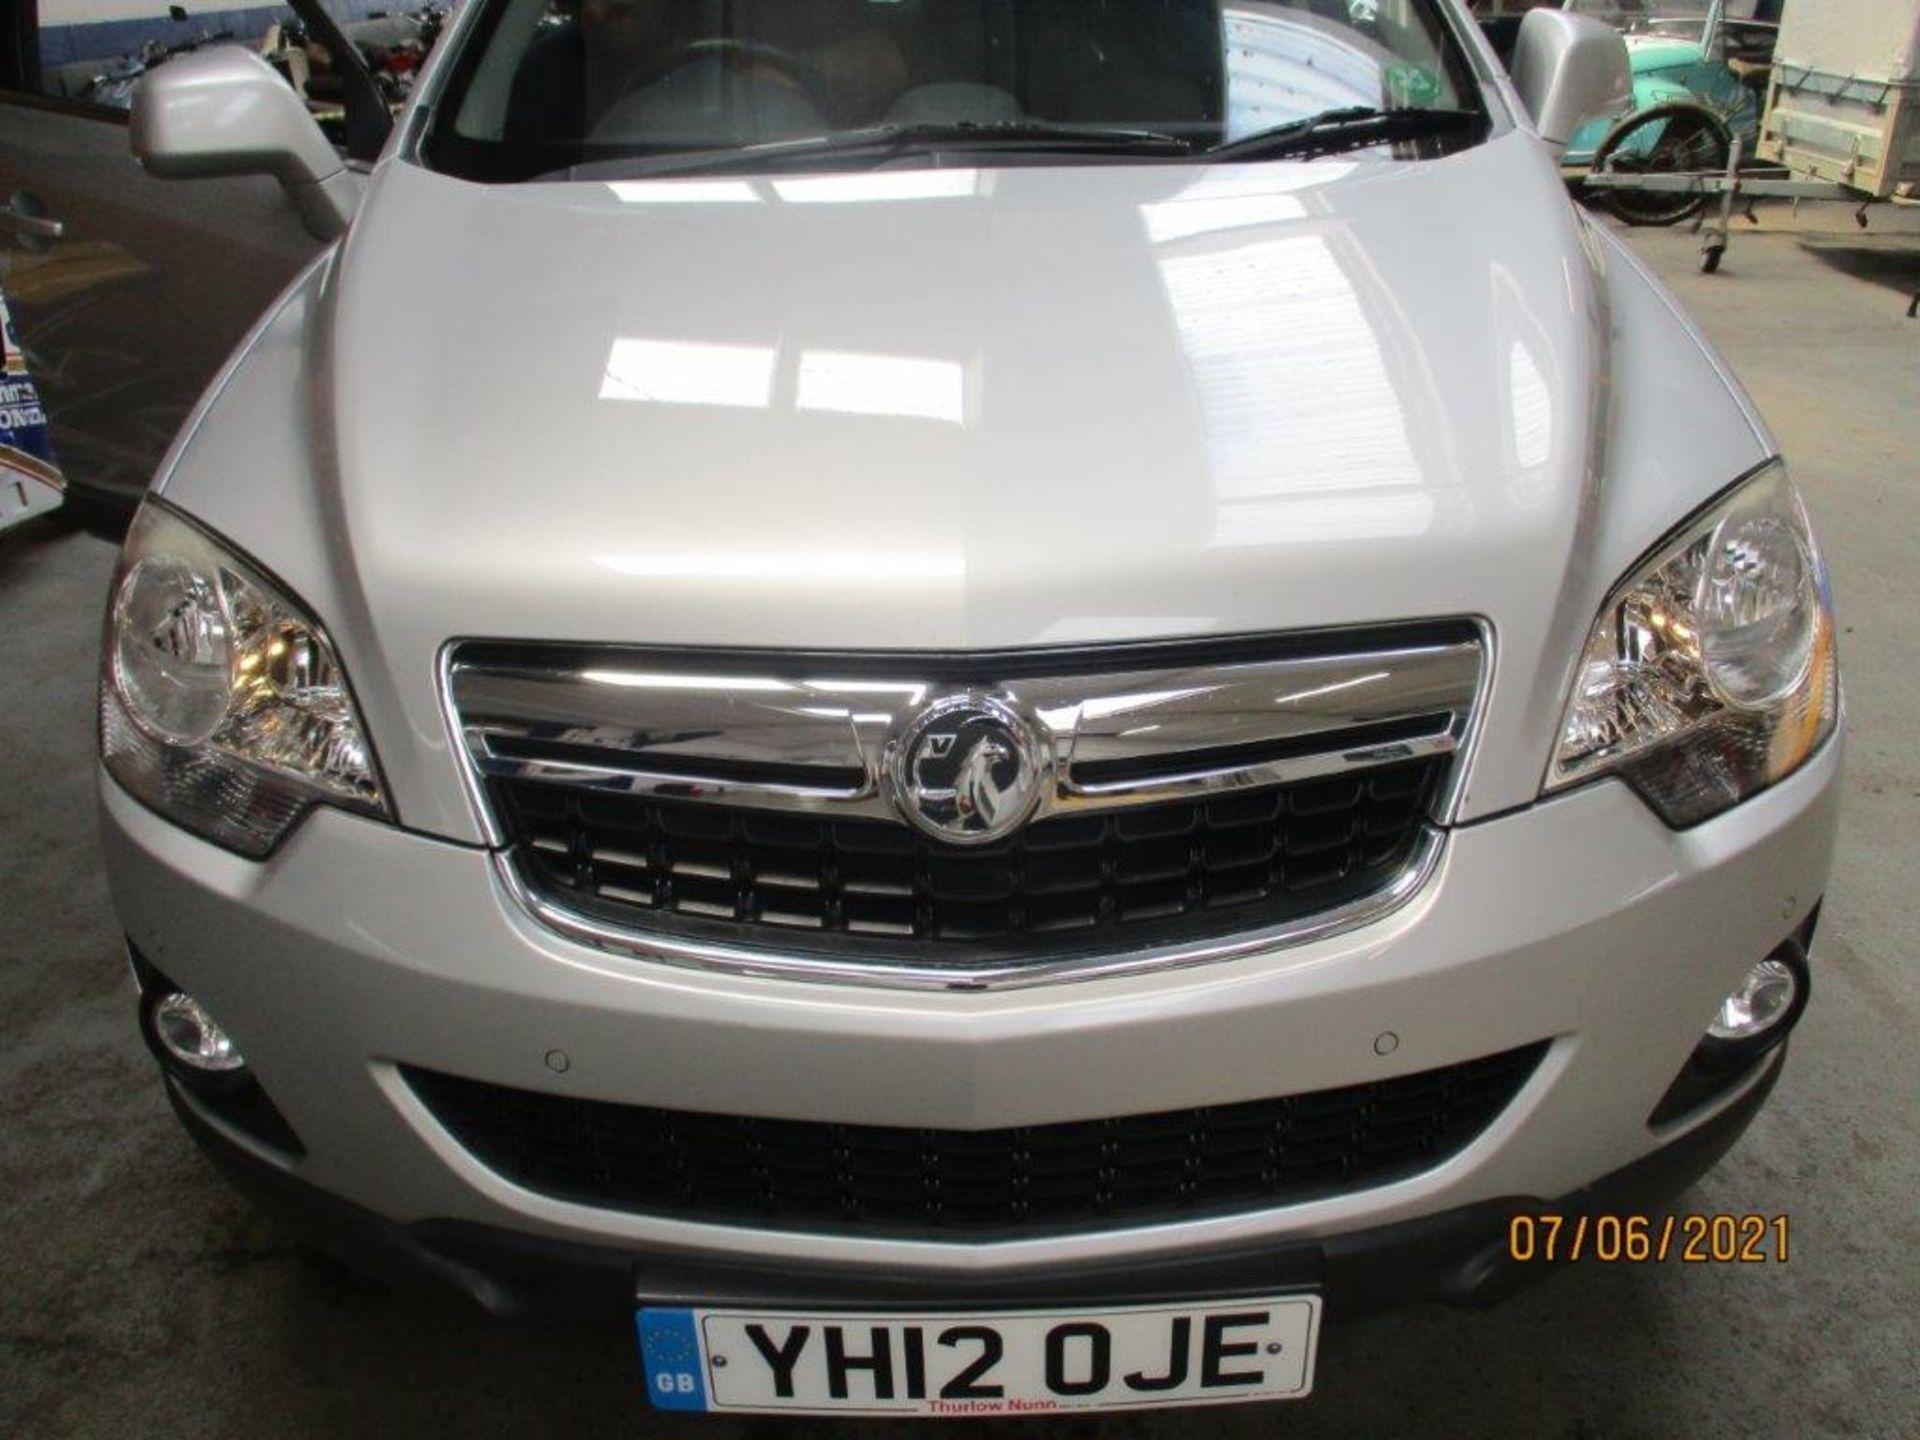 12 12 Vauxhall Antara Excl CDTI - Image 6 of 18